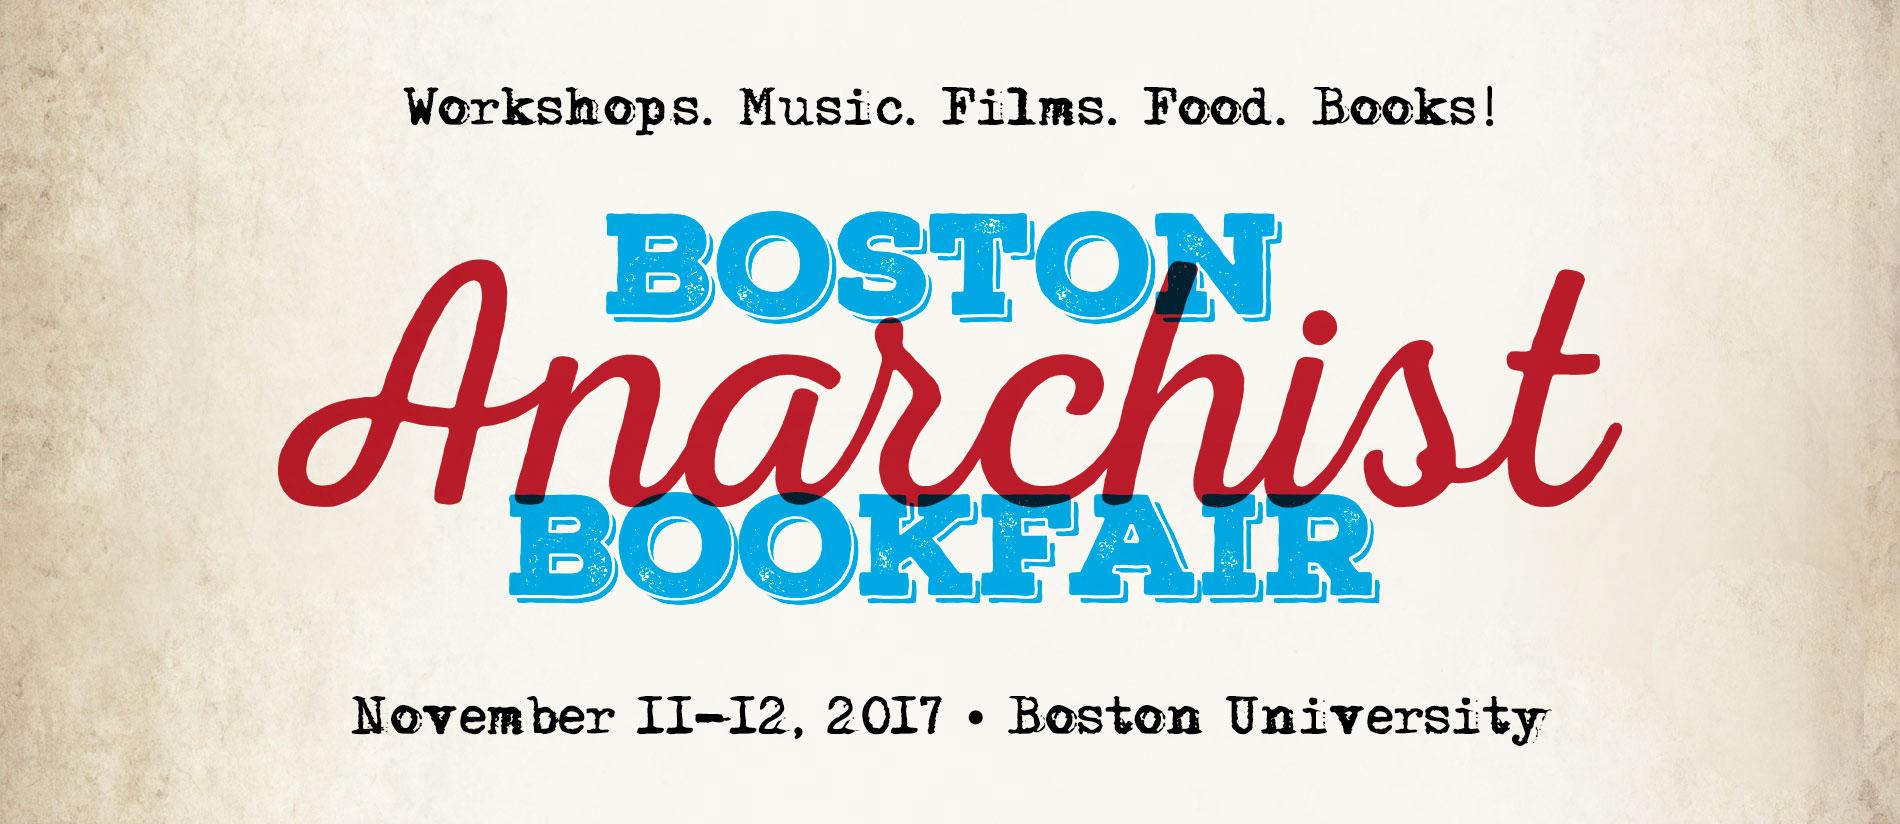 Boston anarchist bookfair 11 11 17 for Craft fair boston 2017